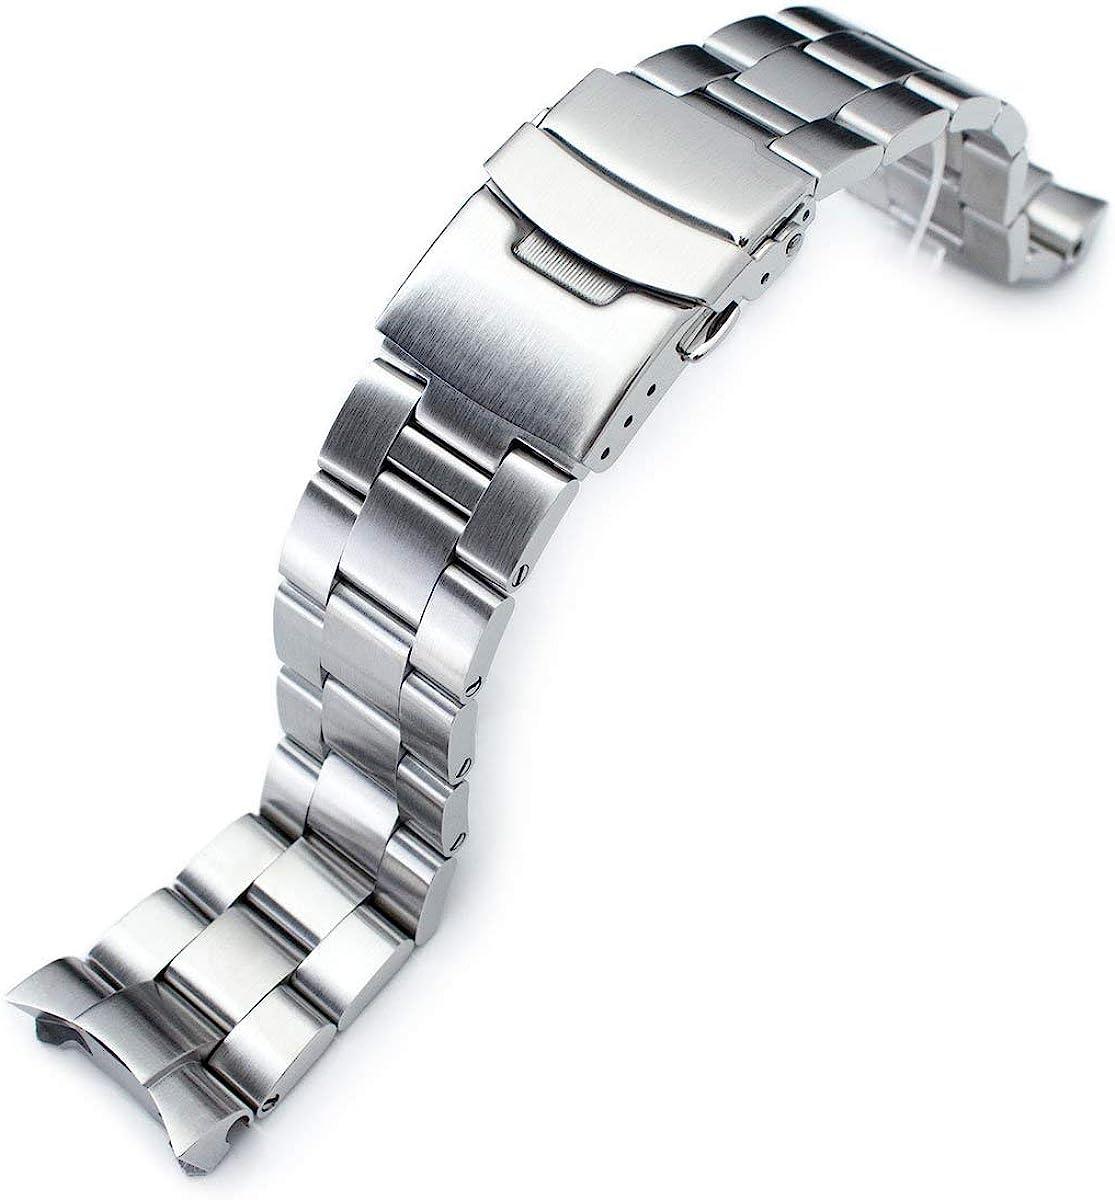 MiLTAT 22mm Watch Band Max 53% OFF for Seiko SKX171 Super-O Max 80% OFF S SKX011 SKX007